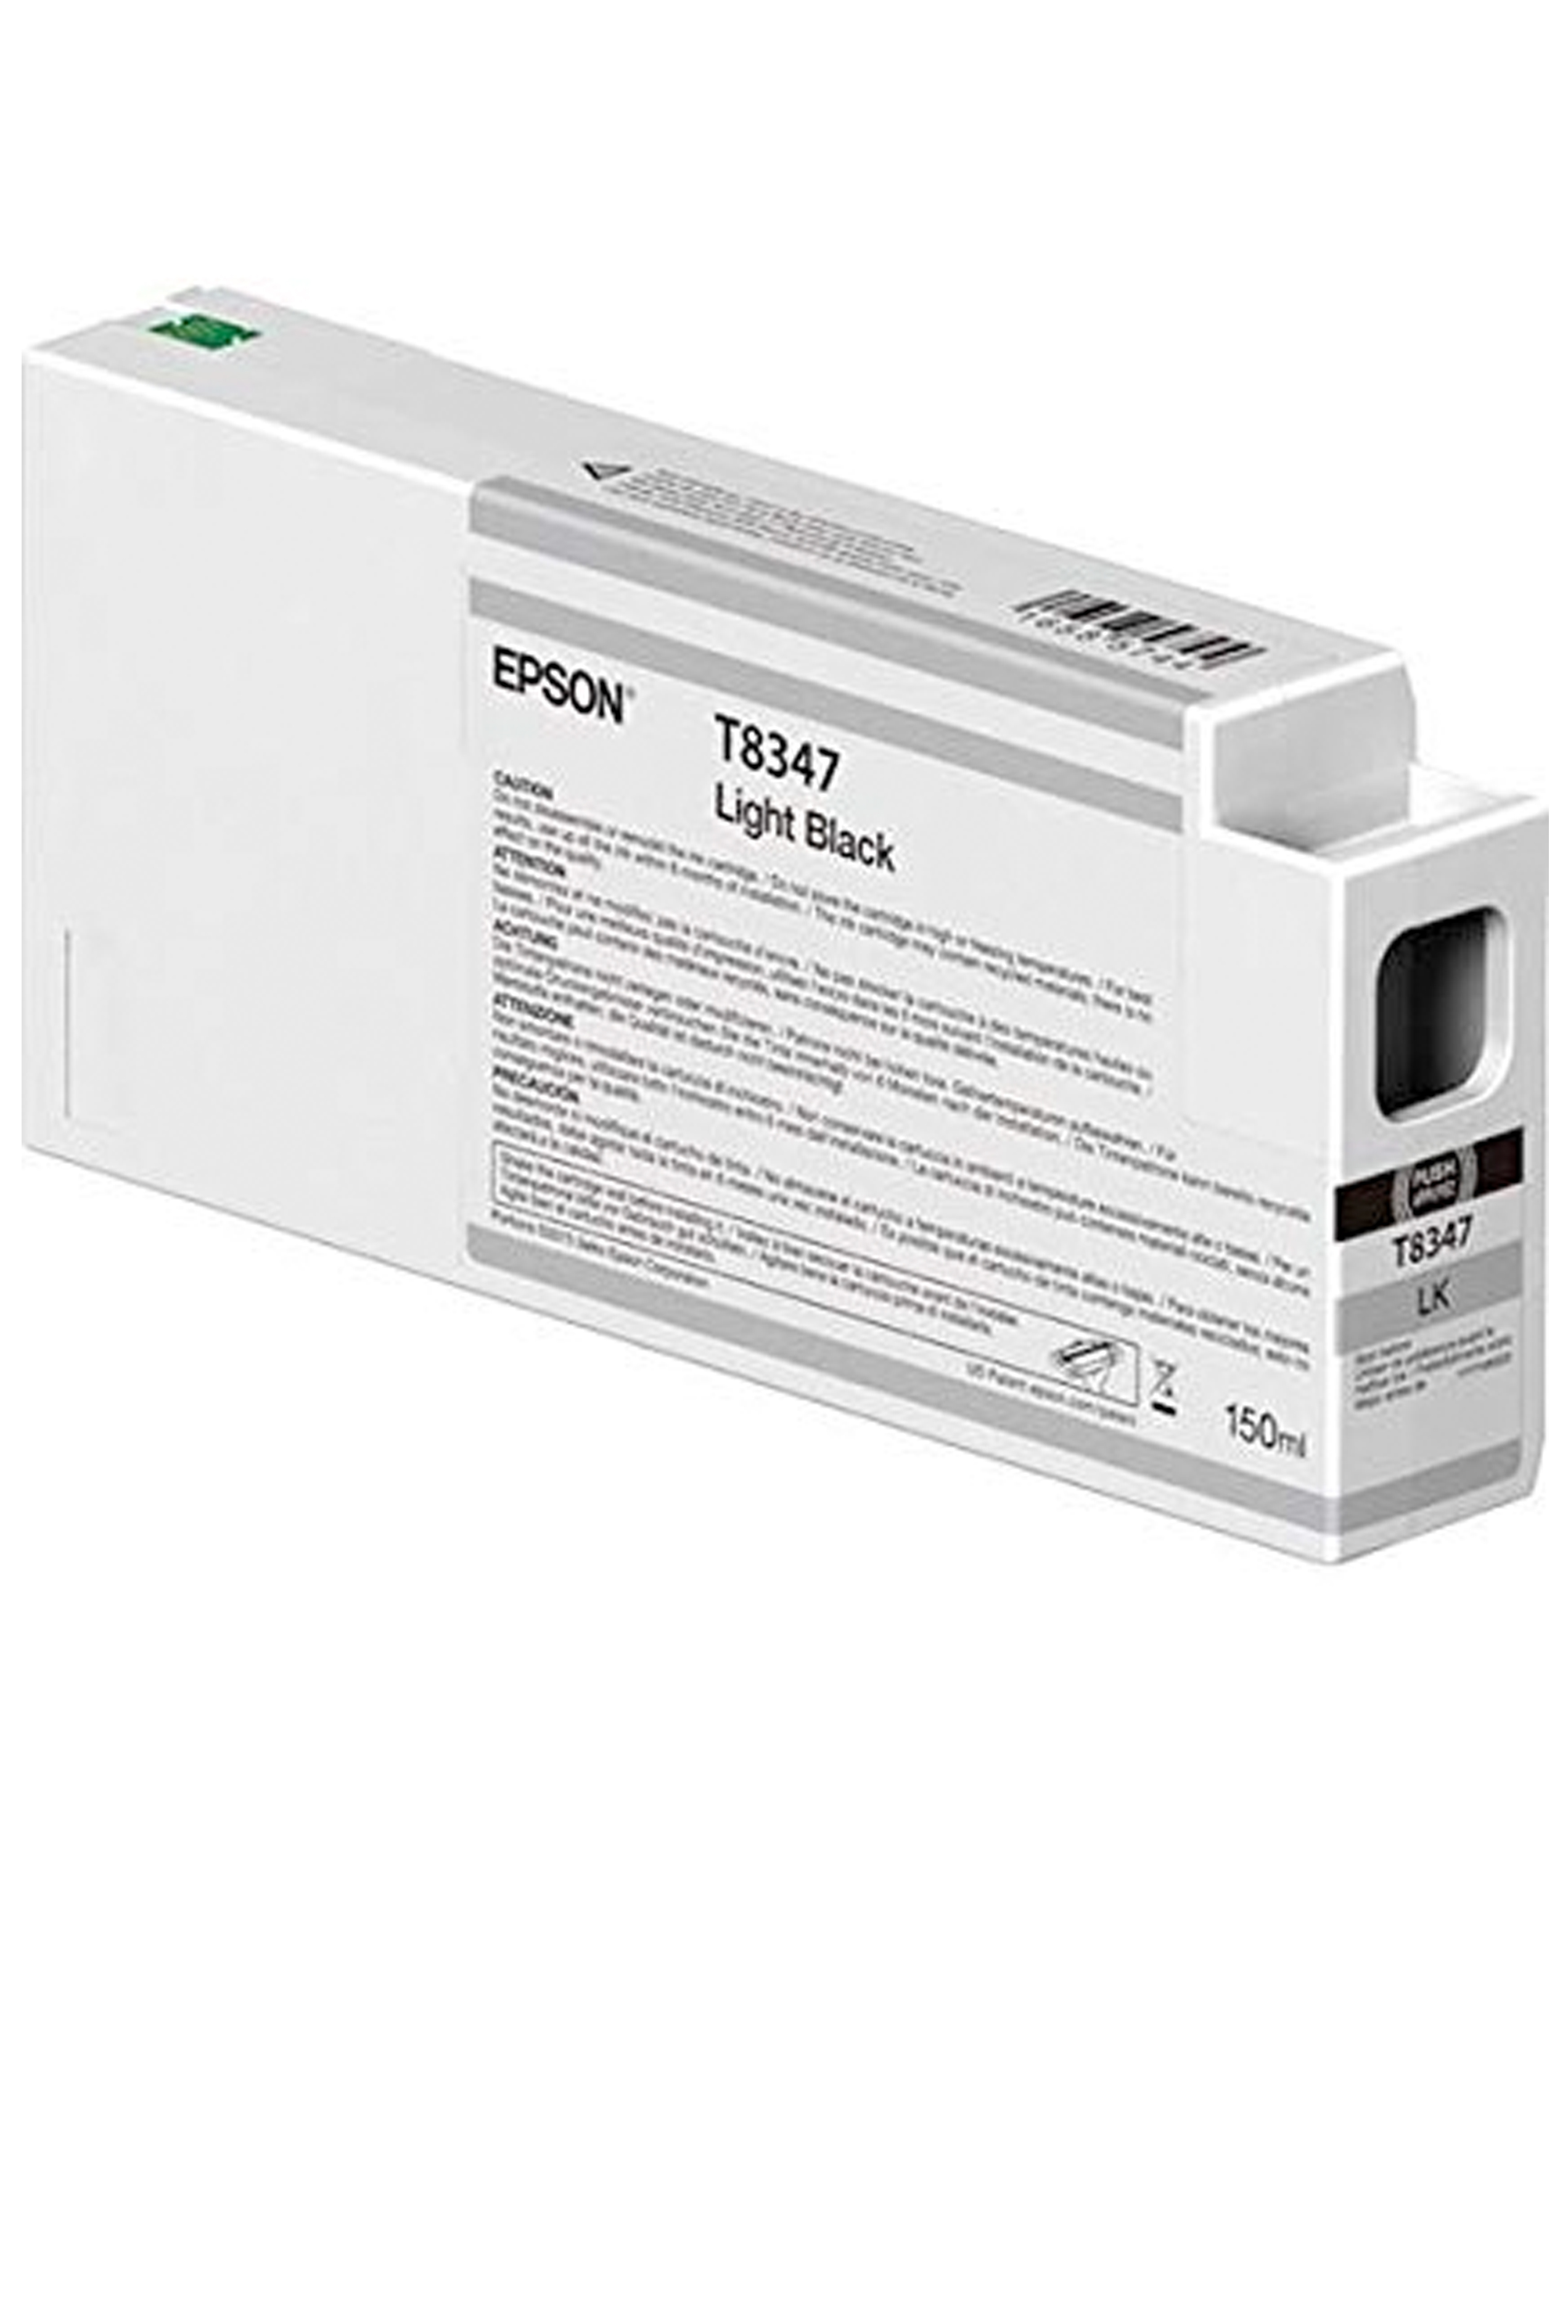 Epson EPSON SD LT BLACK INK (150 ML) (T834700)